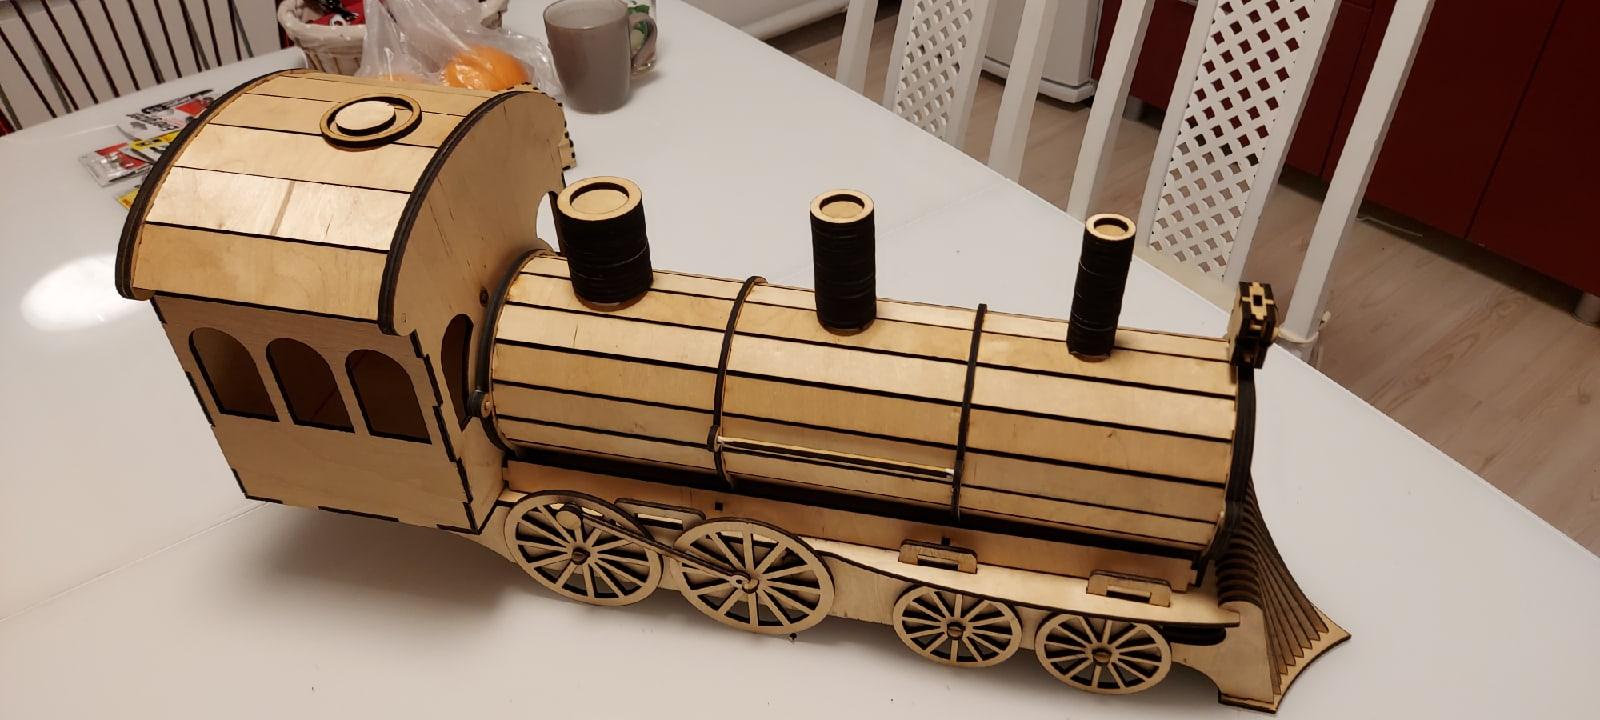 Laser Cut Locomotive Or Train Engine Wine Bottle Holder Gift Box Free DXF File